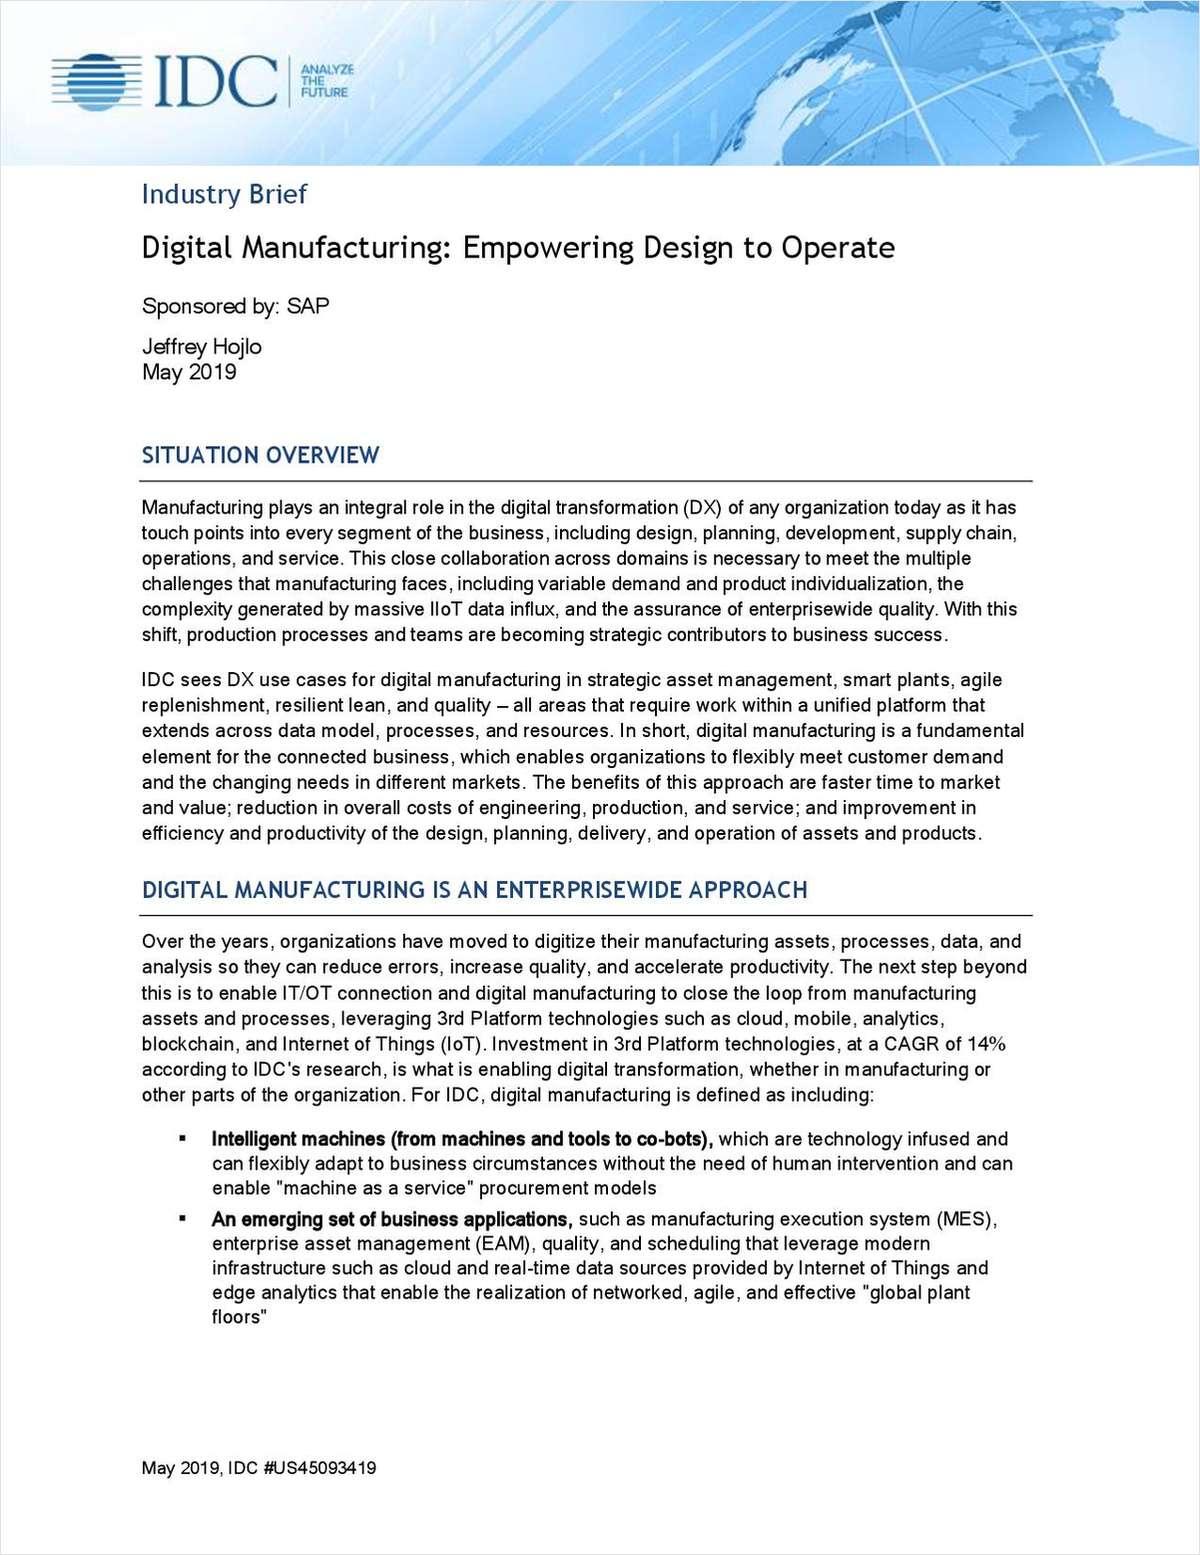 Digital Manufacturing: Empowering Design to Operate